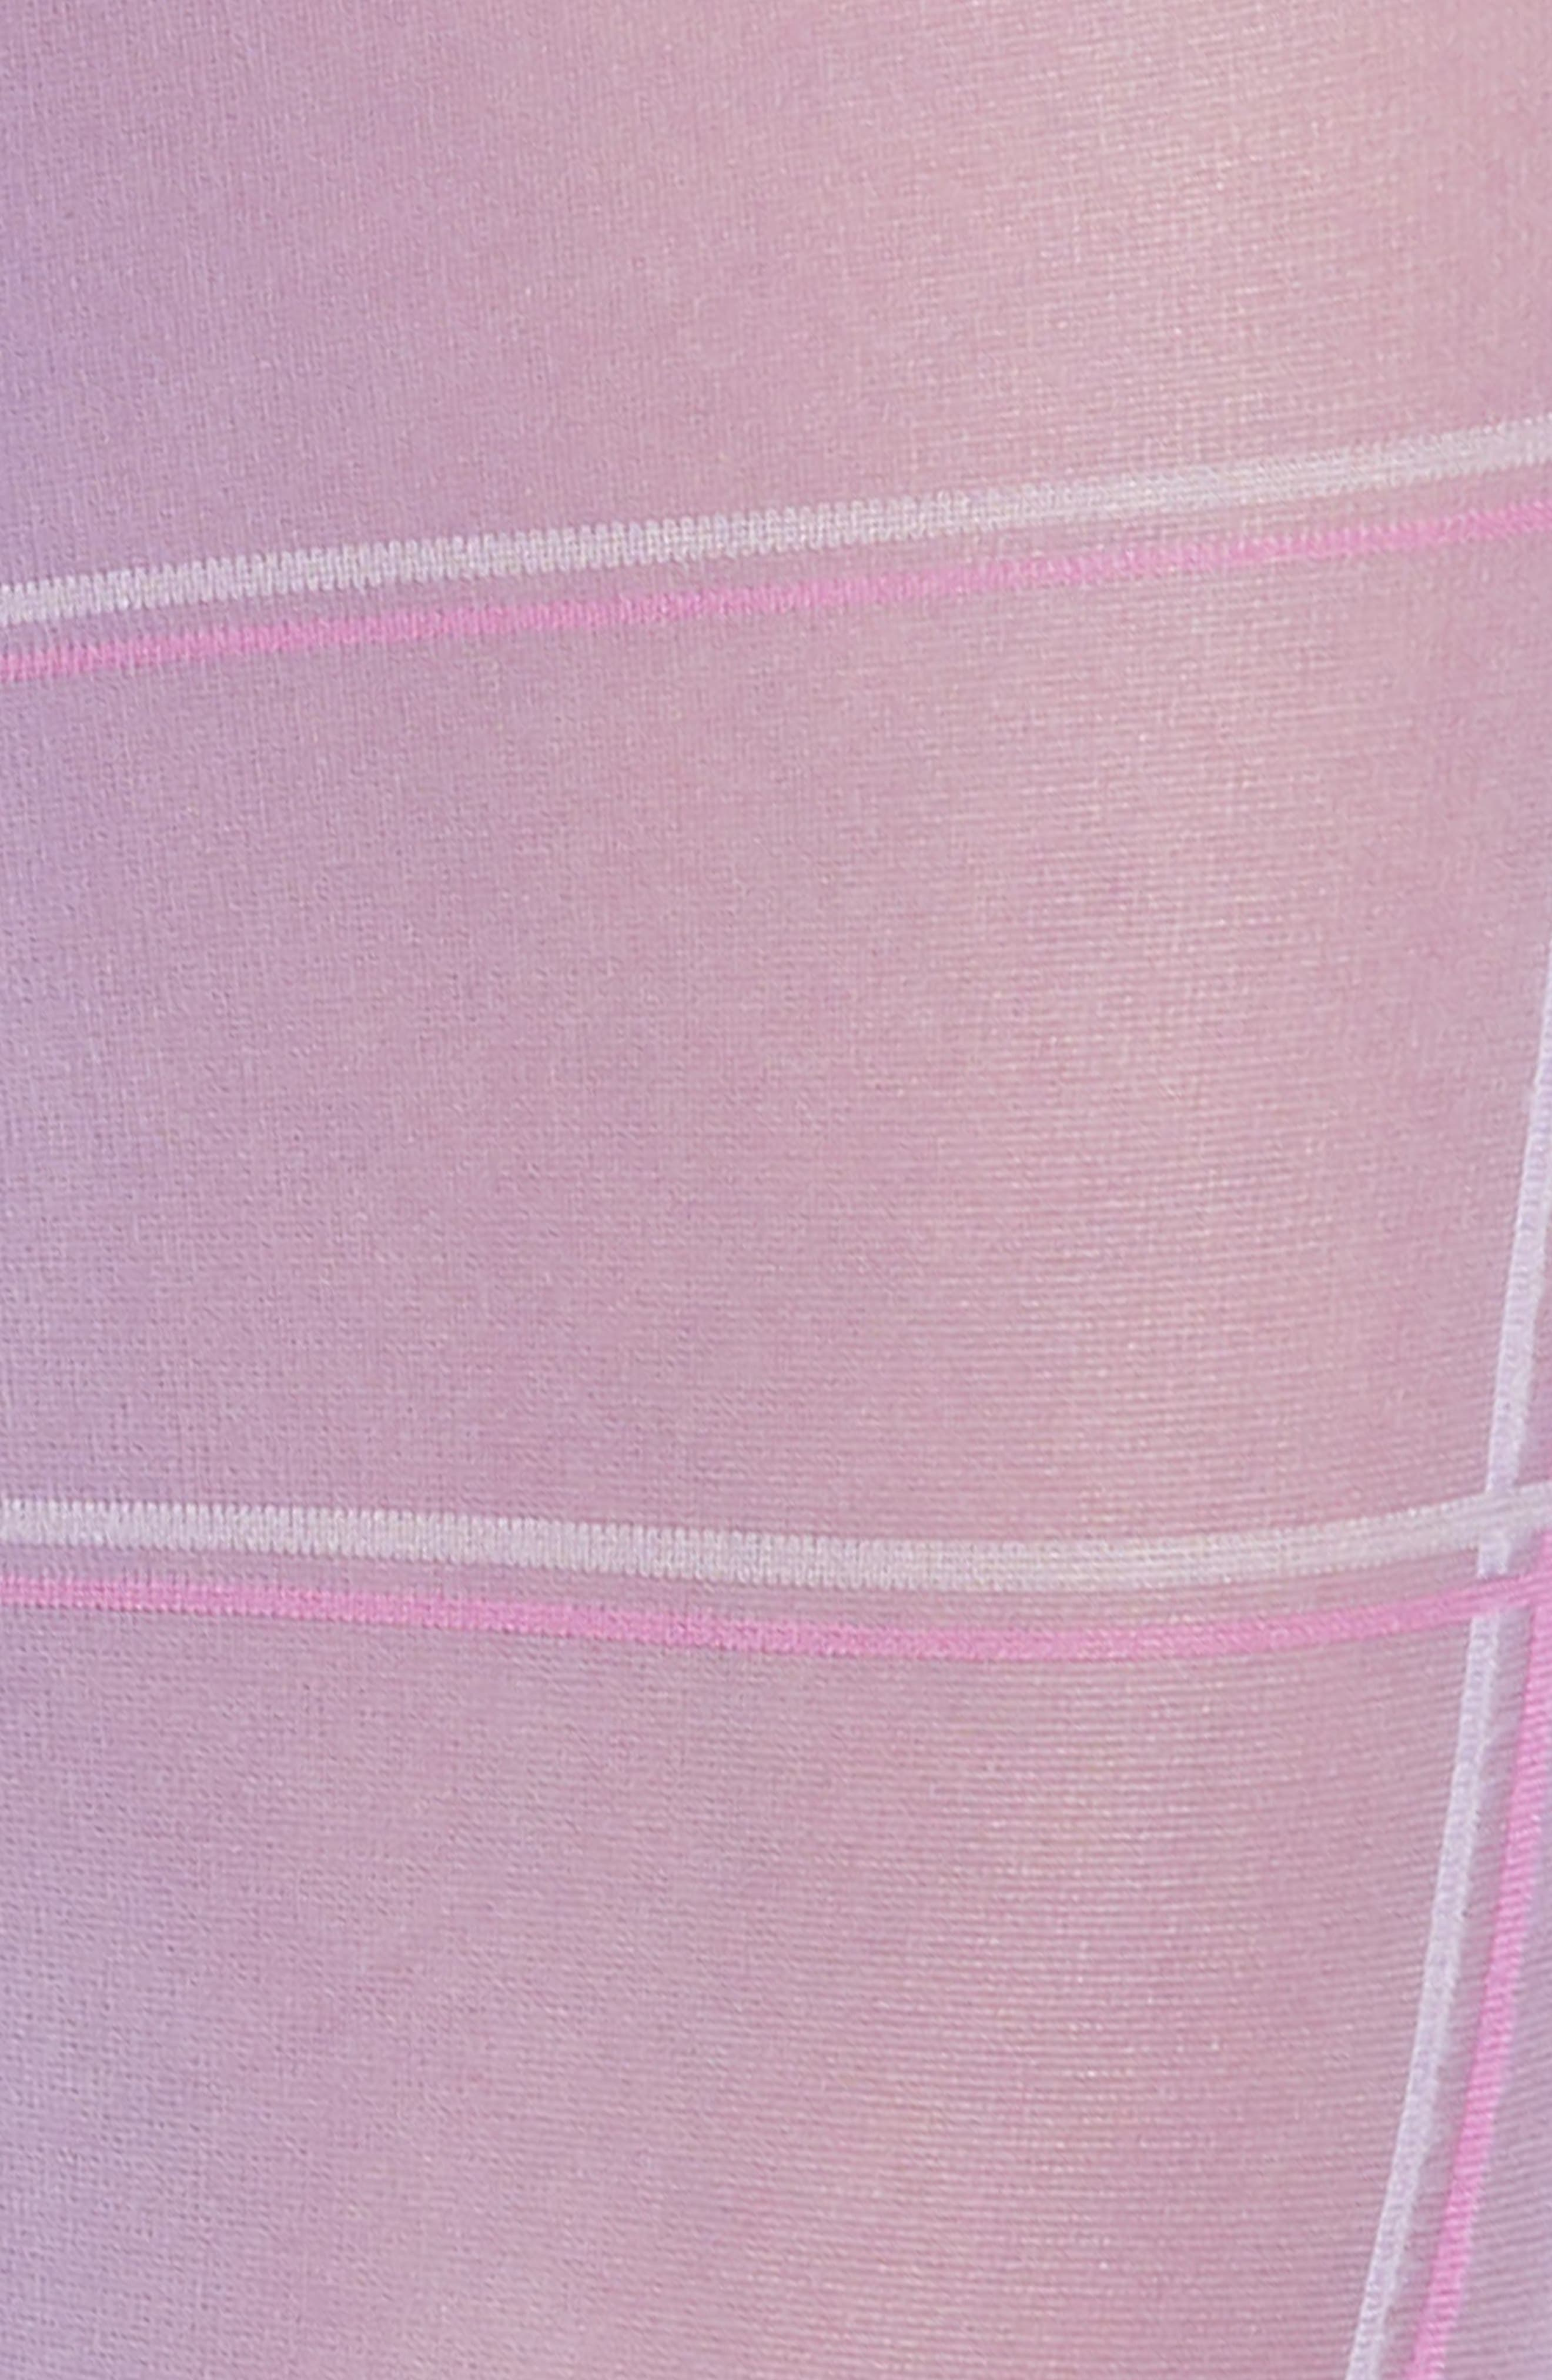 Sheer Plaid Tights,                             Alternate thumbnail 2, color,                             PLAID